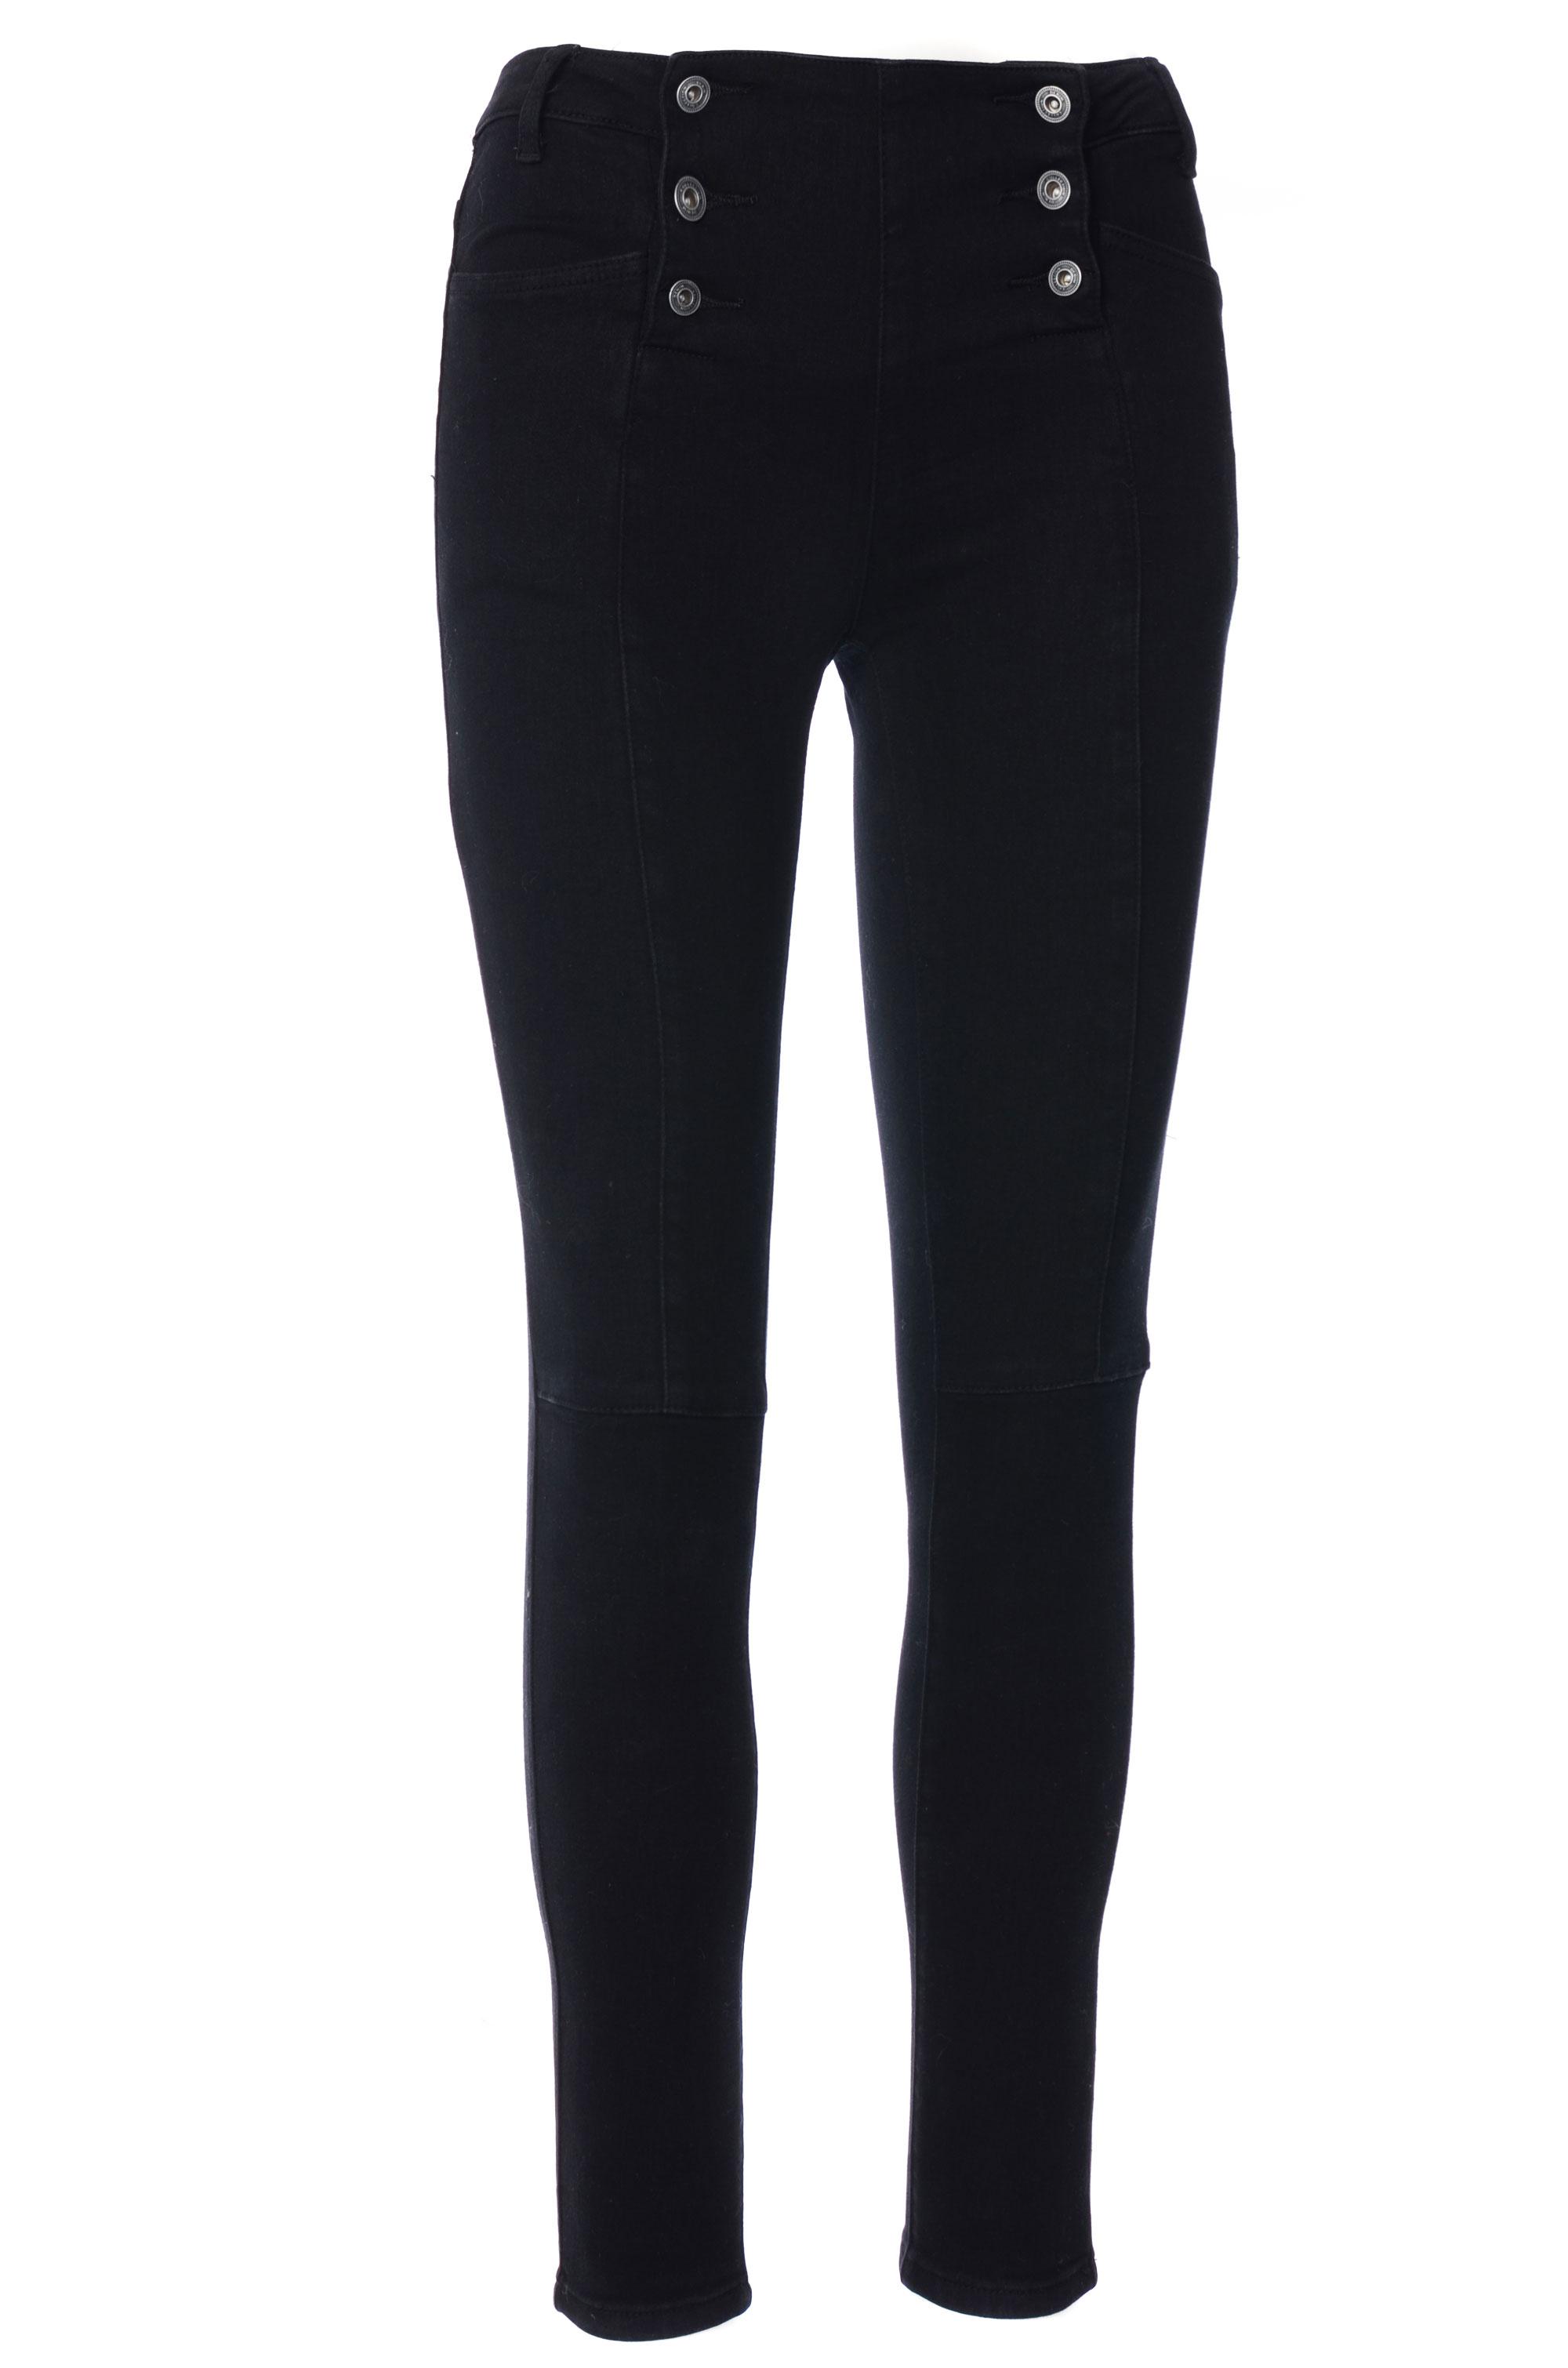 Spodnie - 70-4005 NERO - Unisono